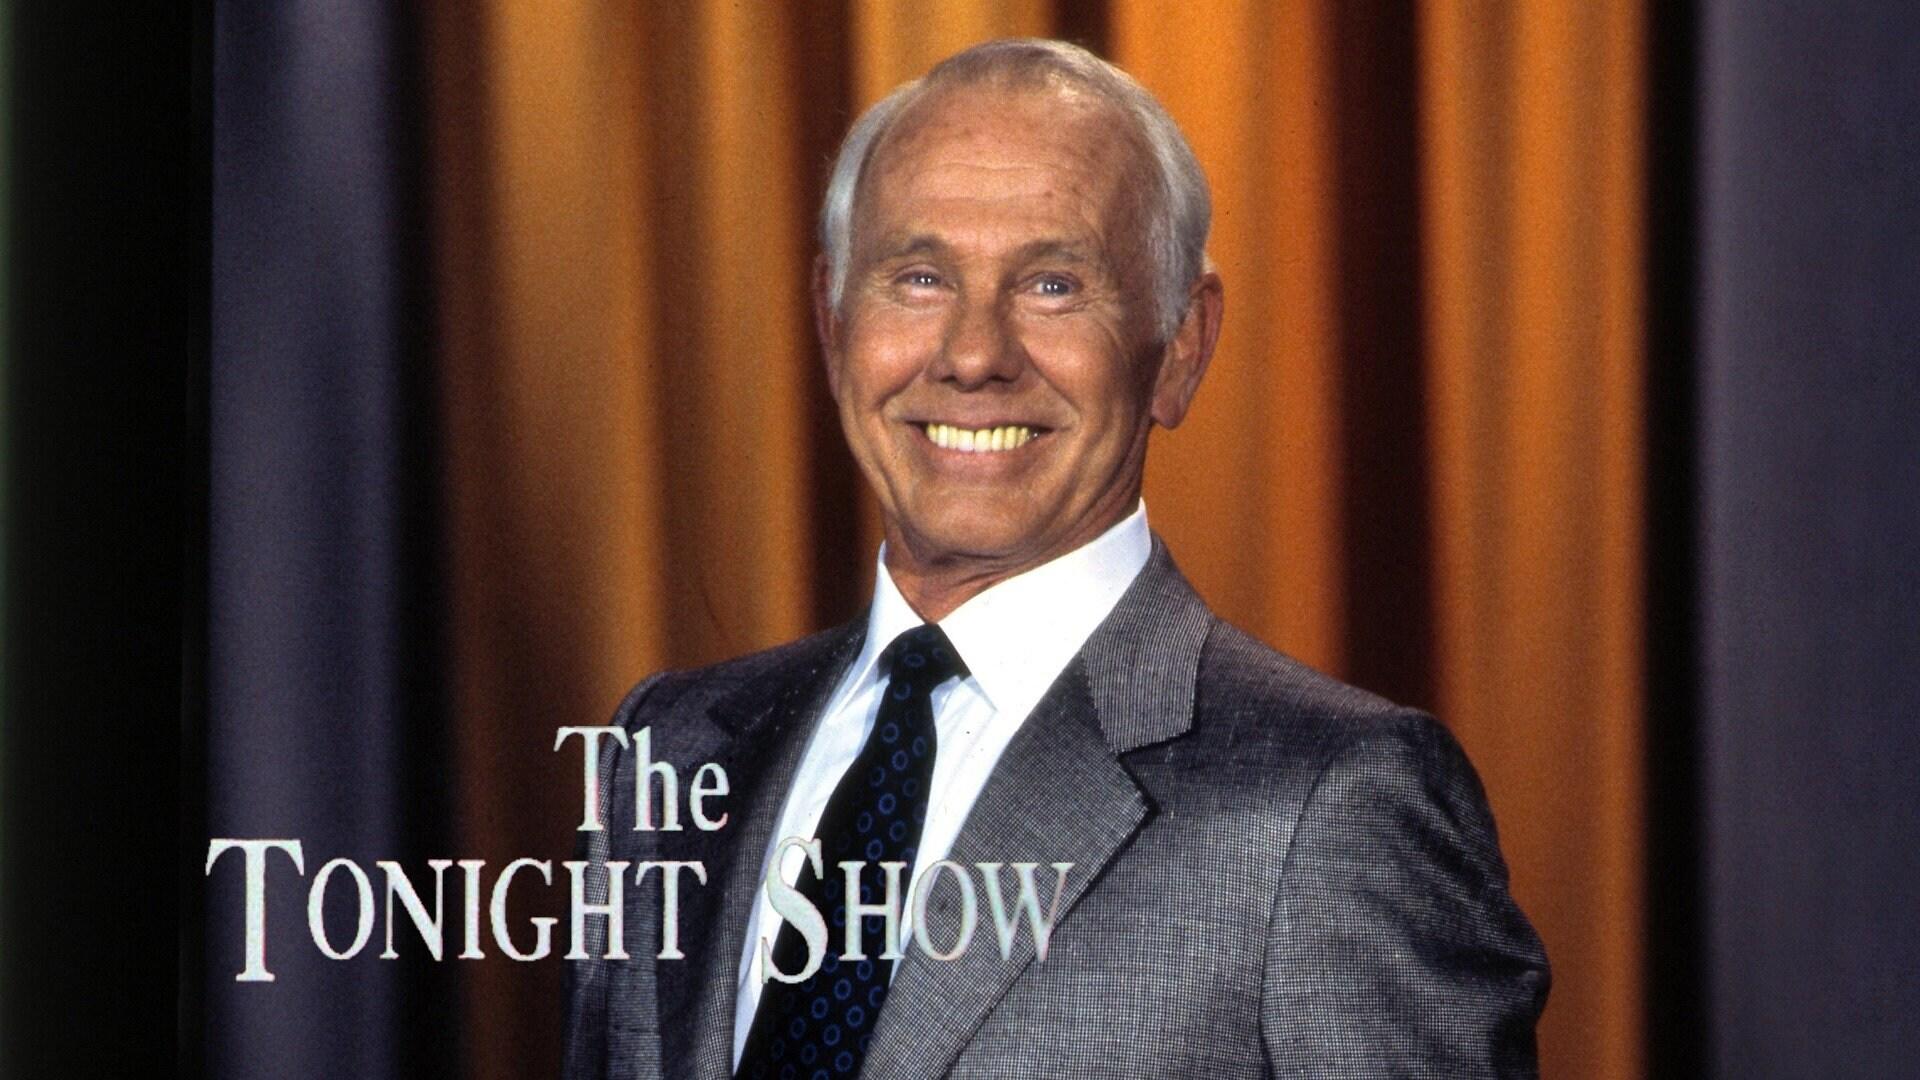 The Johnny Carson Show: Comic Legends Of The '80s - Dana Carvey (5/12/88)